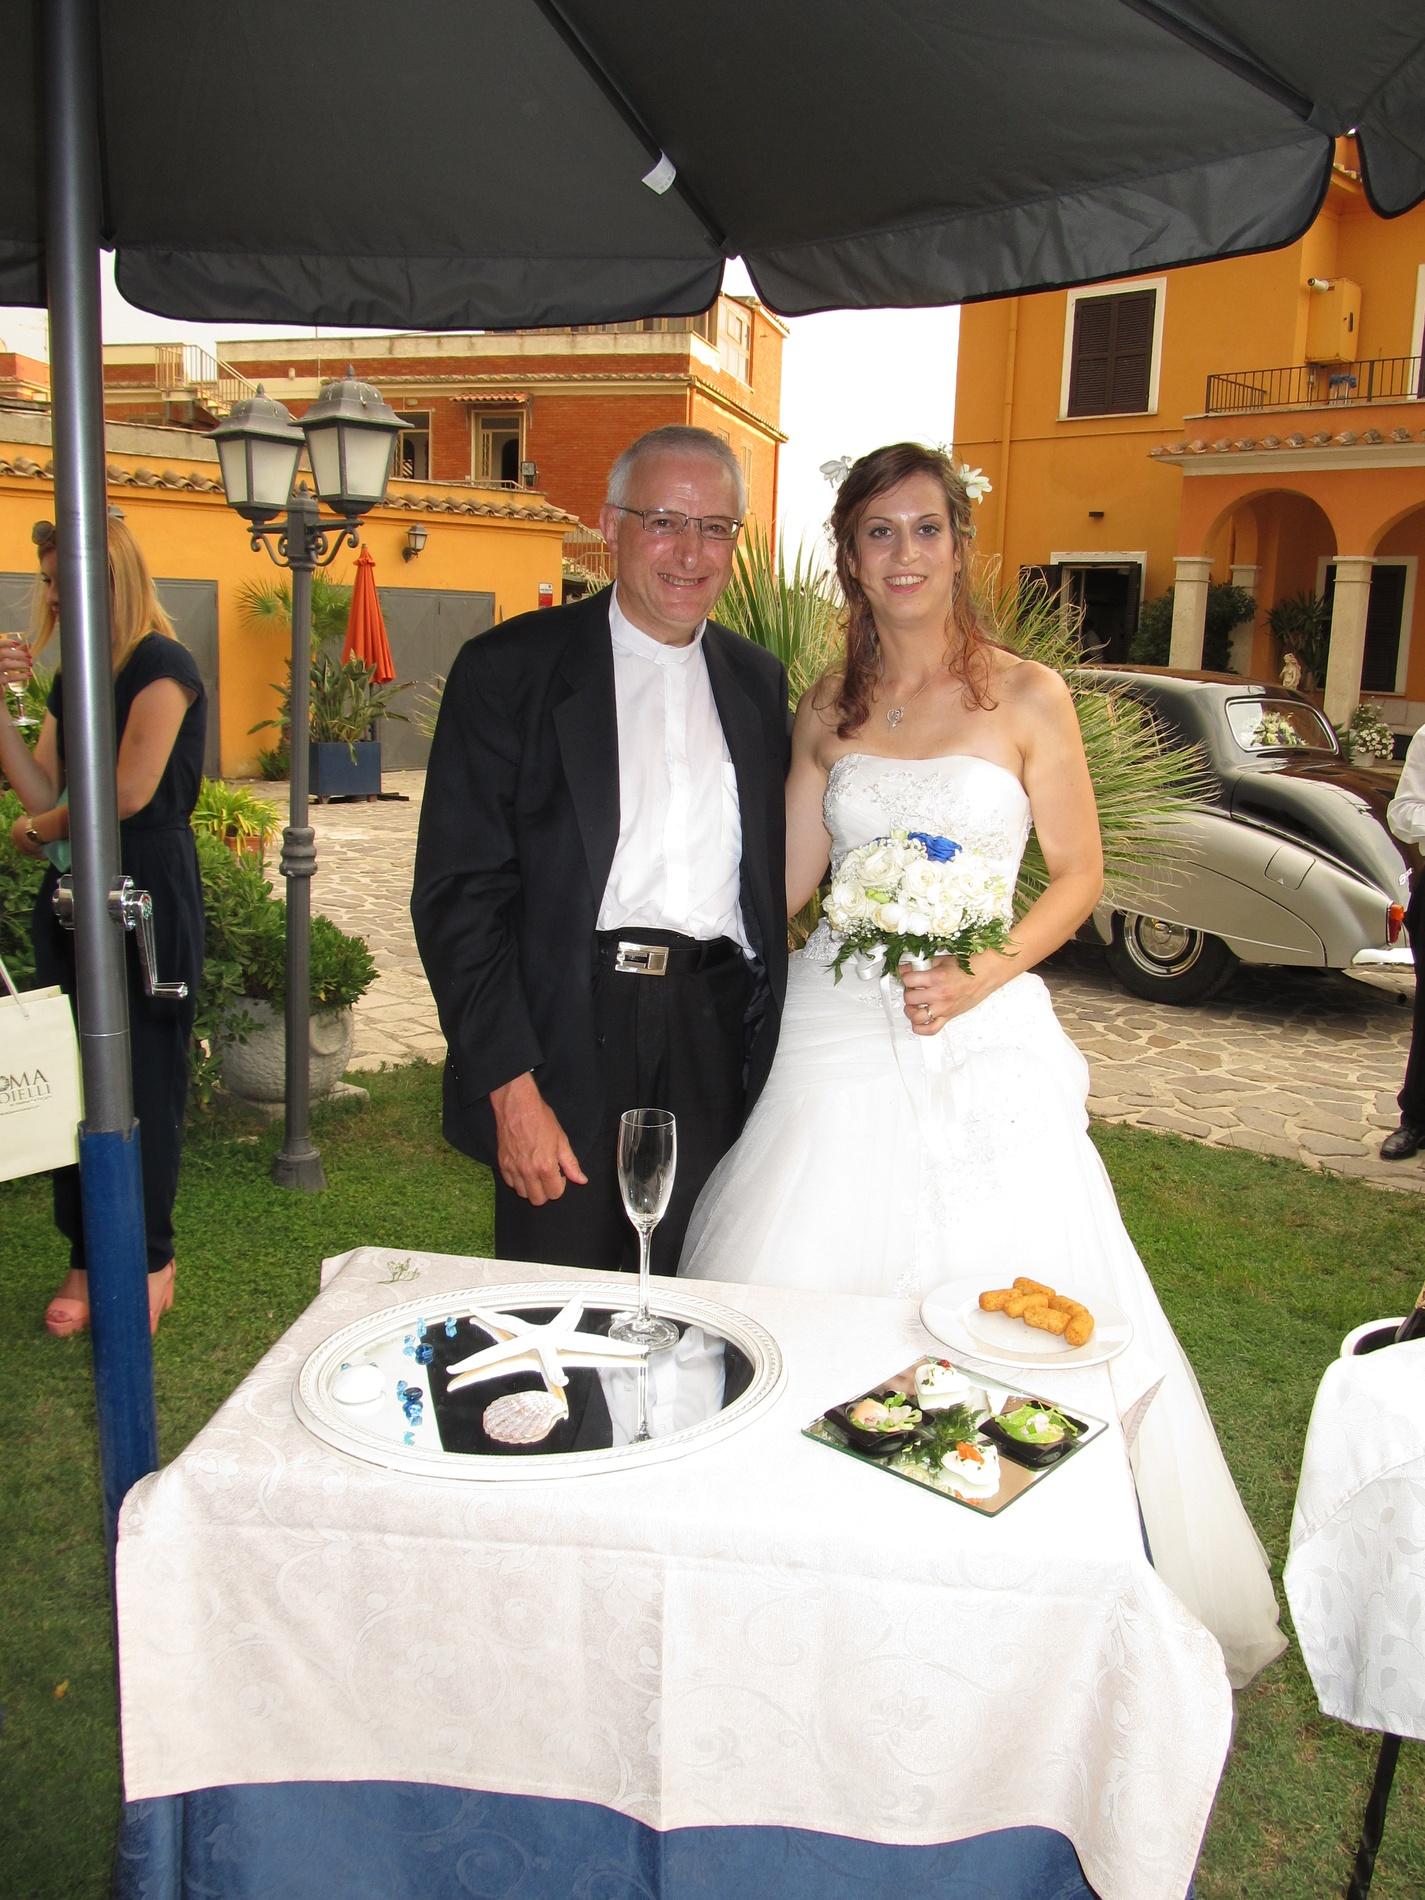 matrimonio-ilaria-torrisi-e-marco-di-lucia-2015-08-08-19-35-13